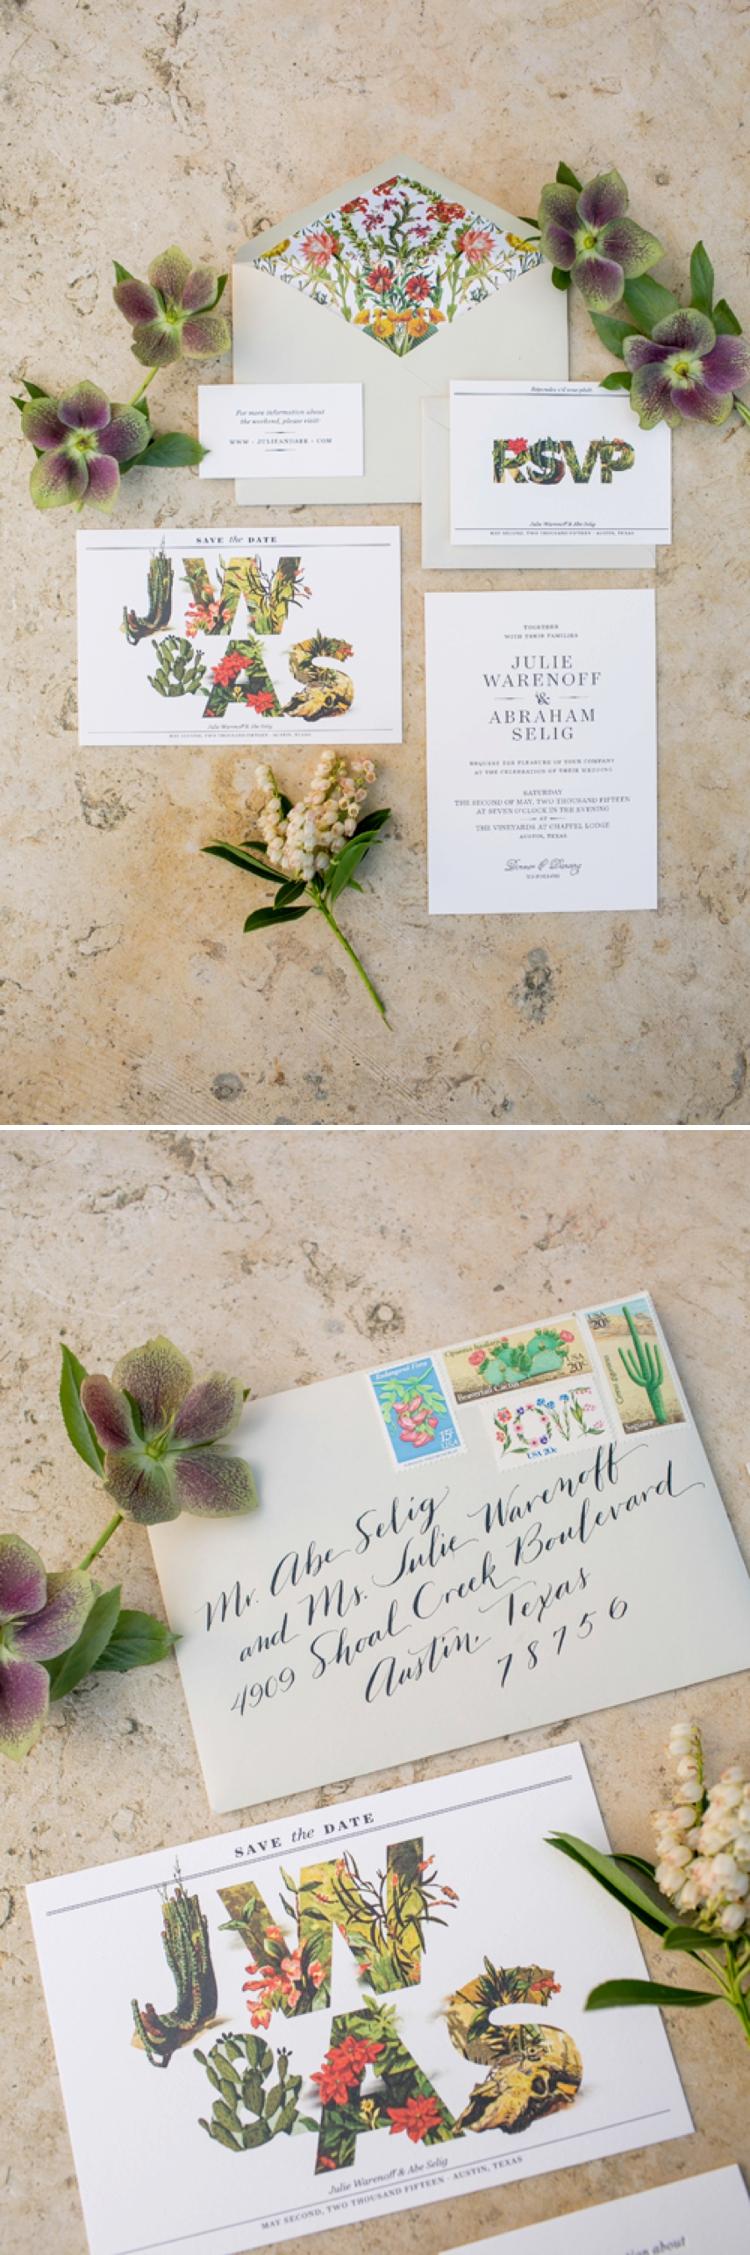 Outdoor Jewish wedding, with a vintage botanical theme, at Vineyards ...